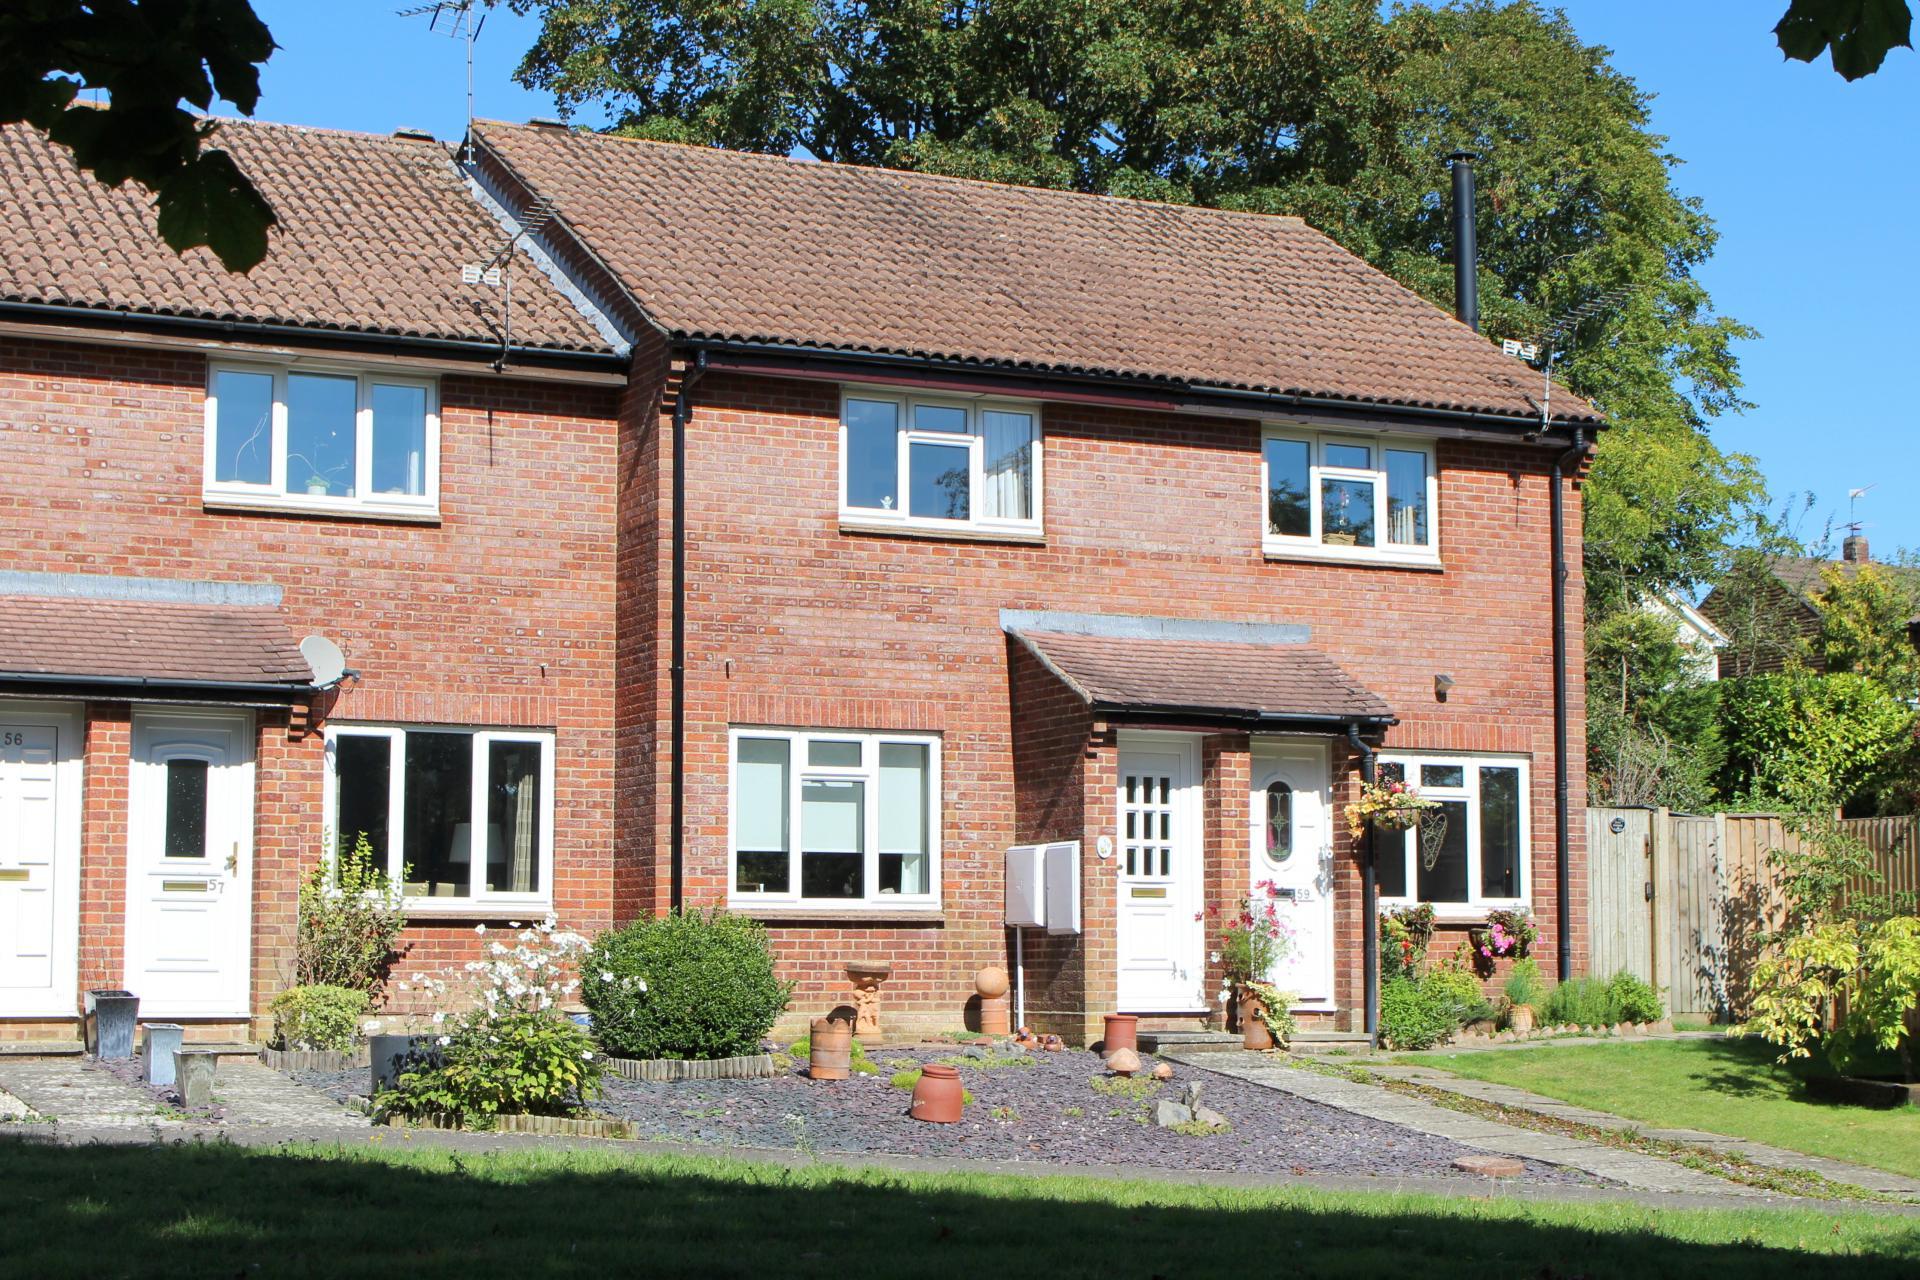 Hellards Estate Agents (Alresford) family house for sale